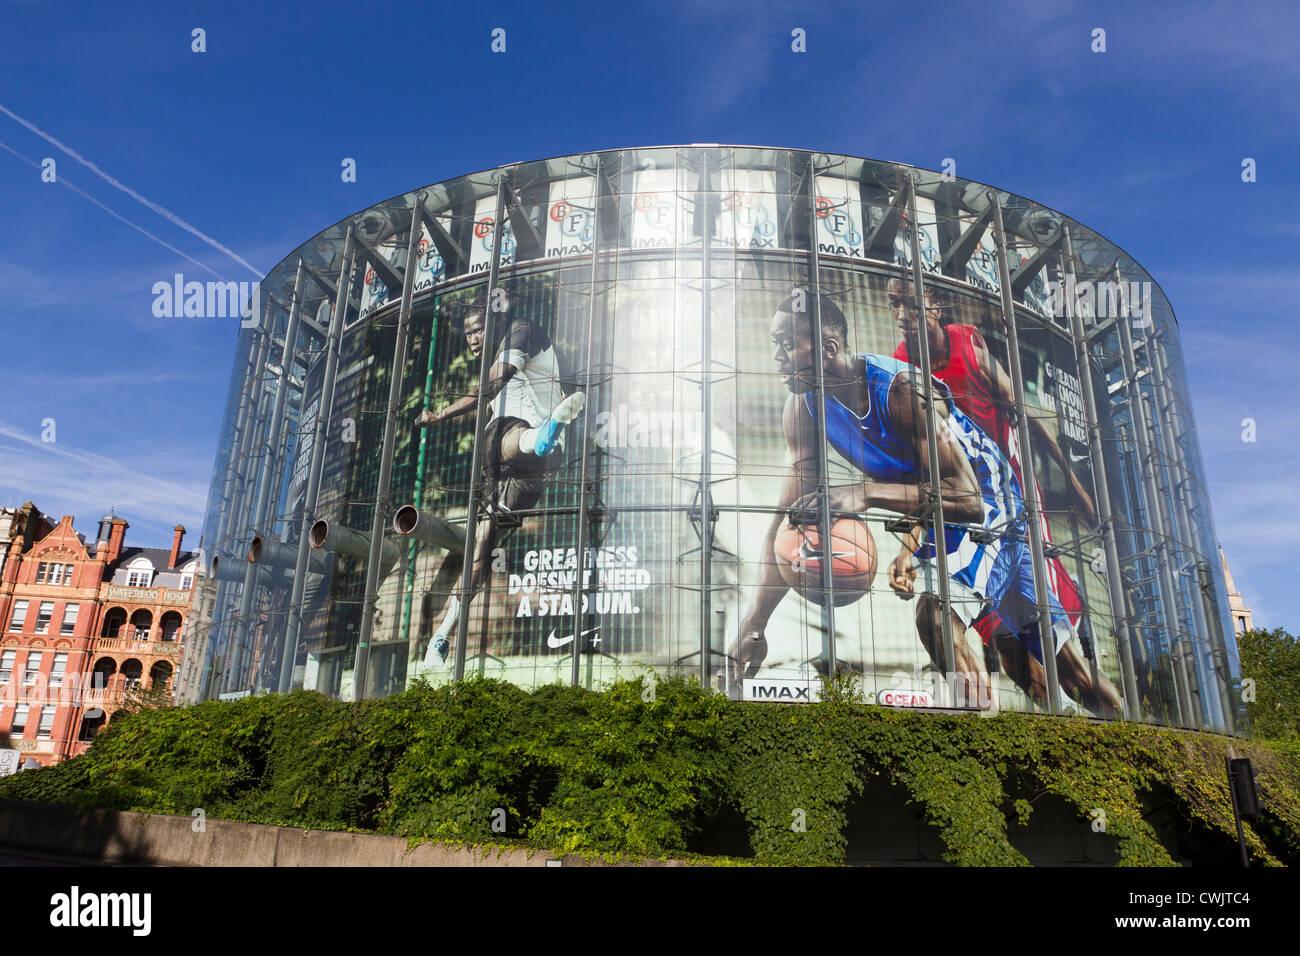 The London BFI Imax building, London, England, UK - Stock Image